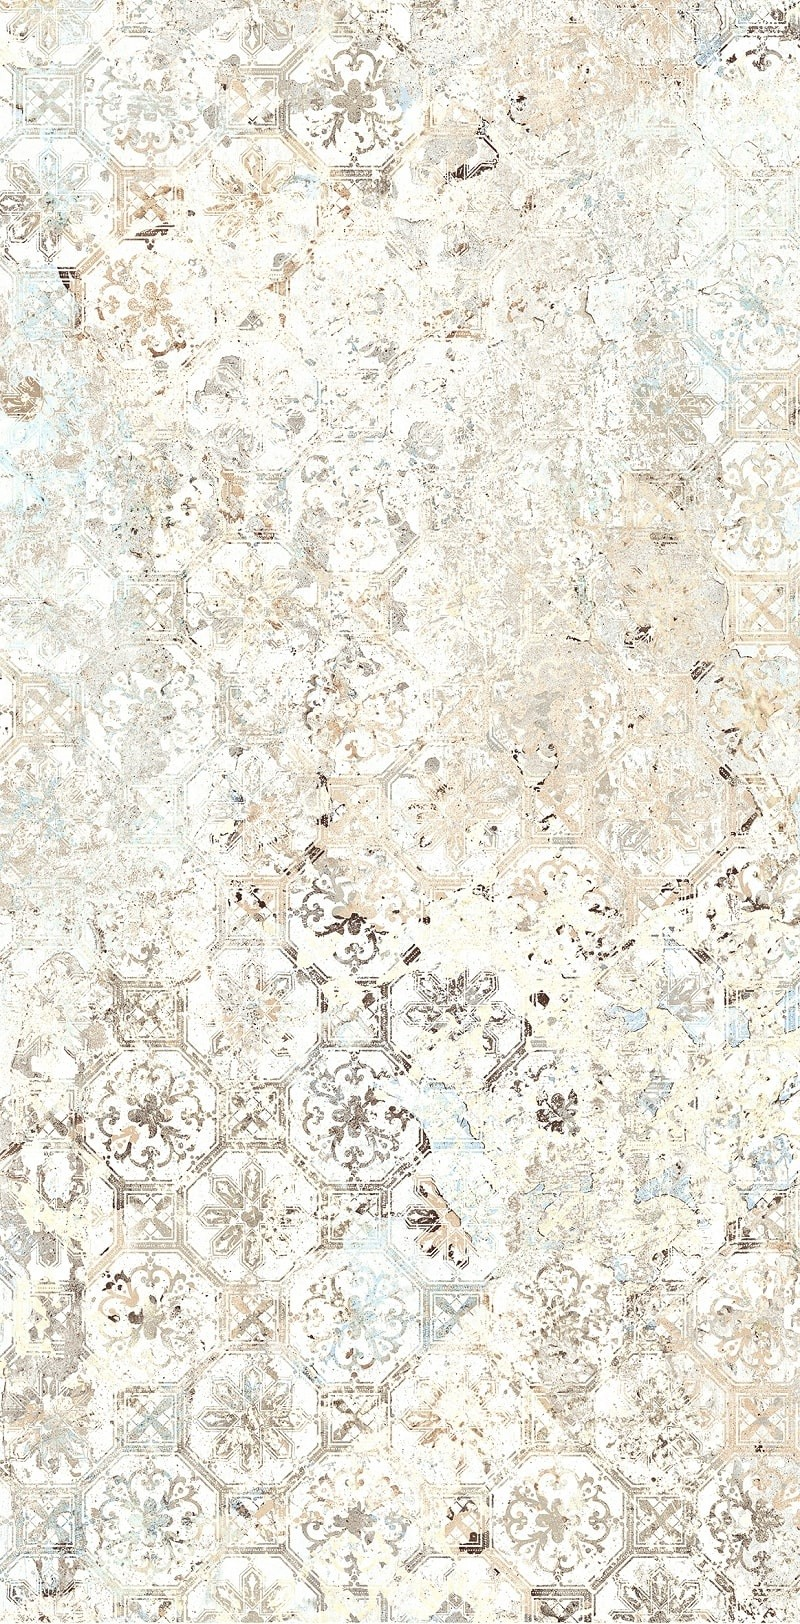 Carrelage CARPET SAND NATURAL 50x100 cm - R9 - 1.50m² - zoom